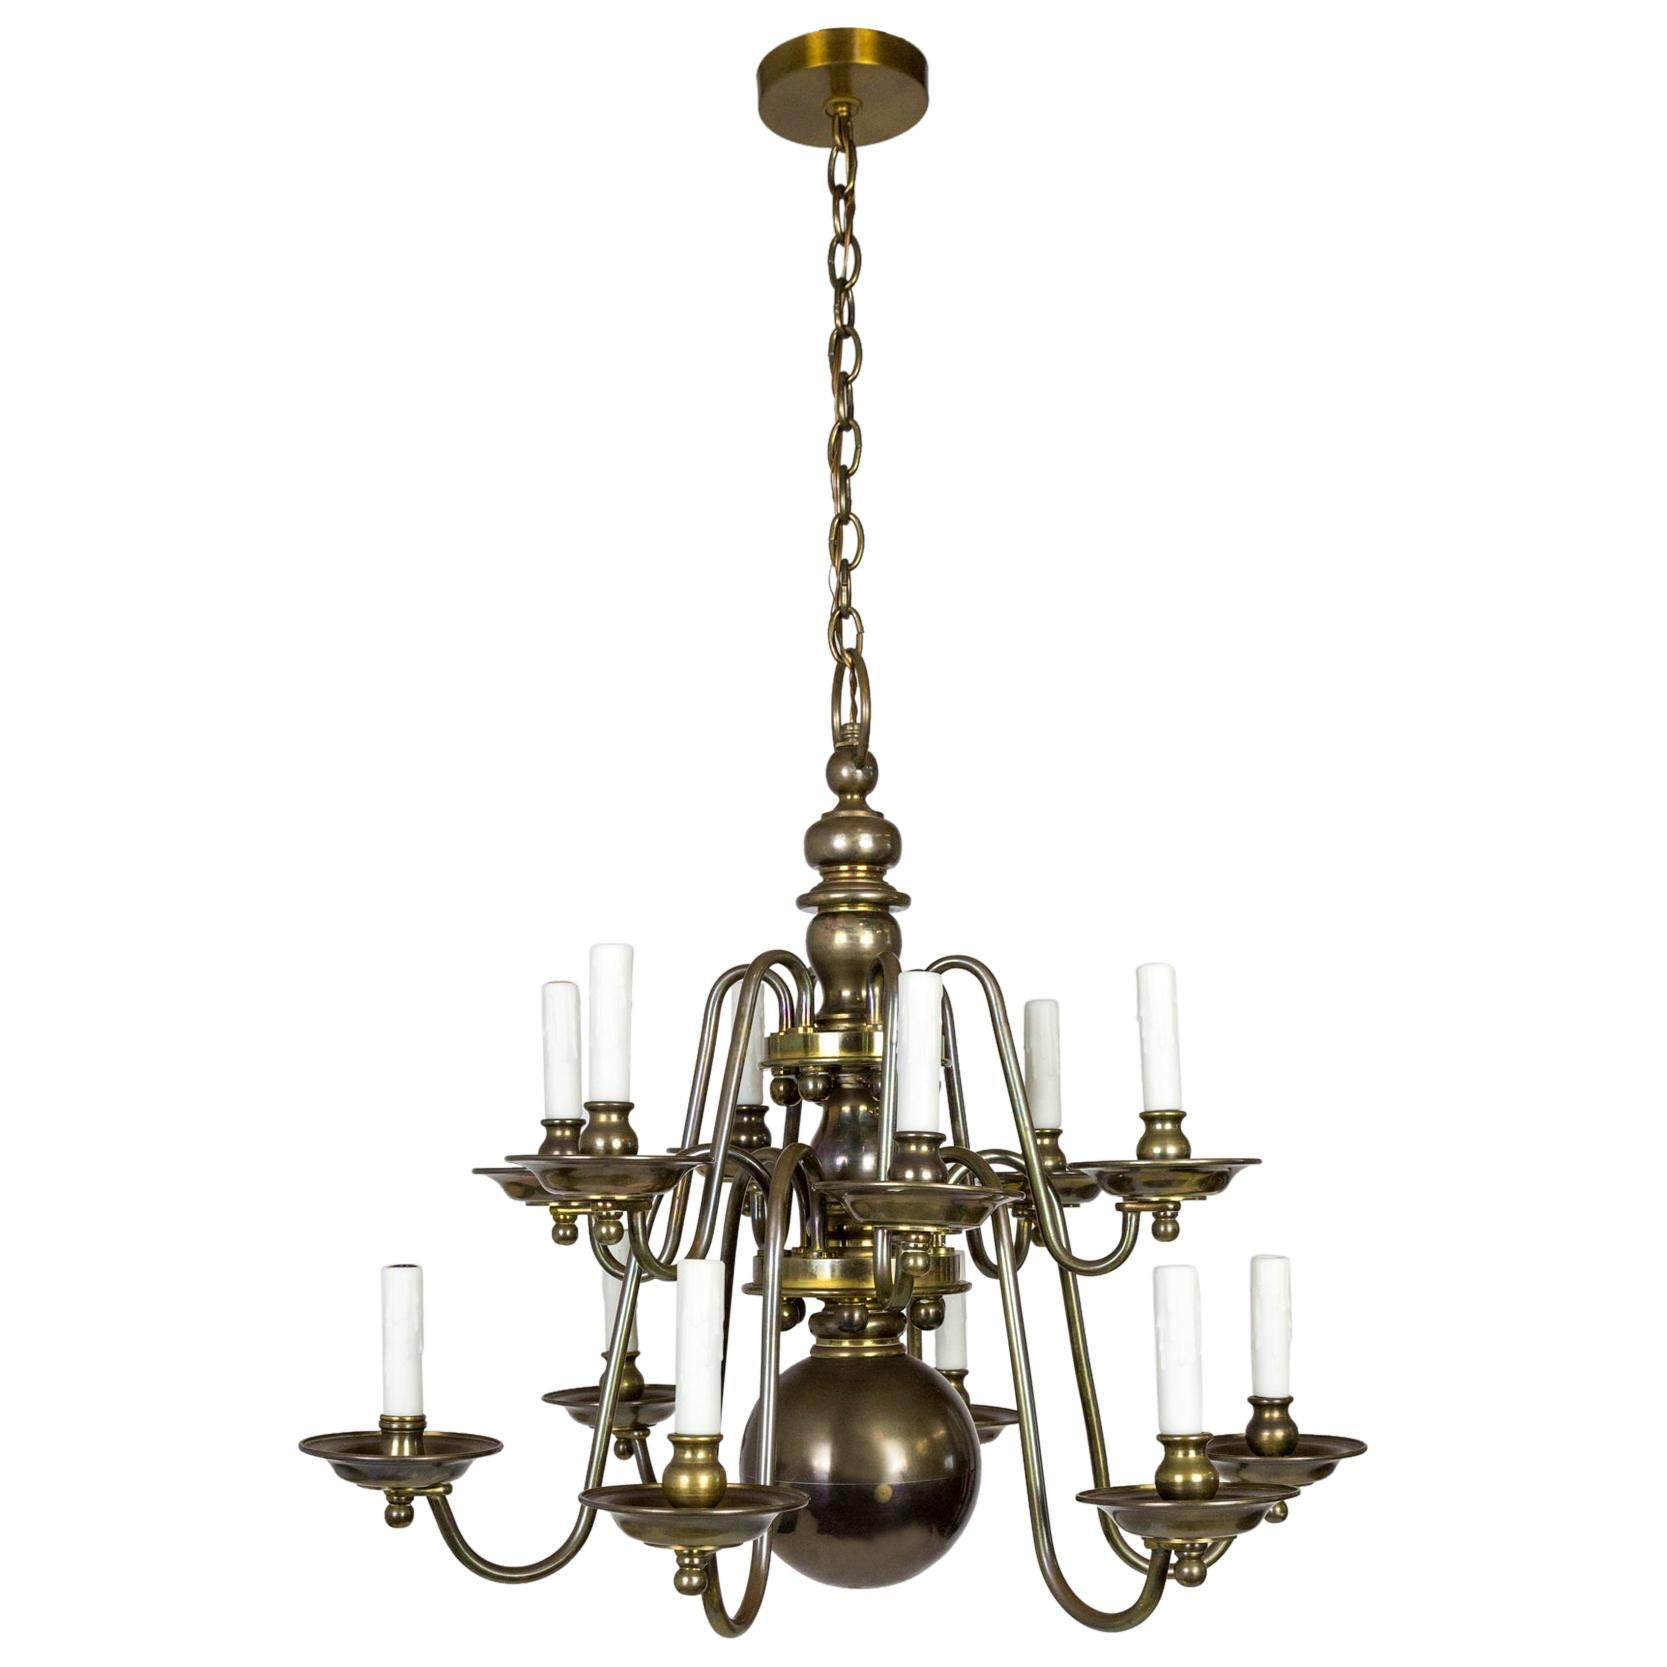 Dutch Baroque Style 2-Tier Aged Brass 12-Light Chandelier